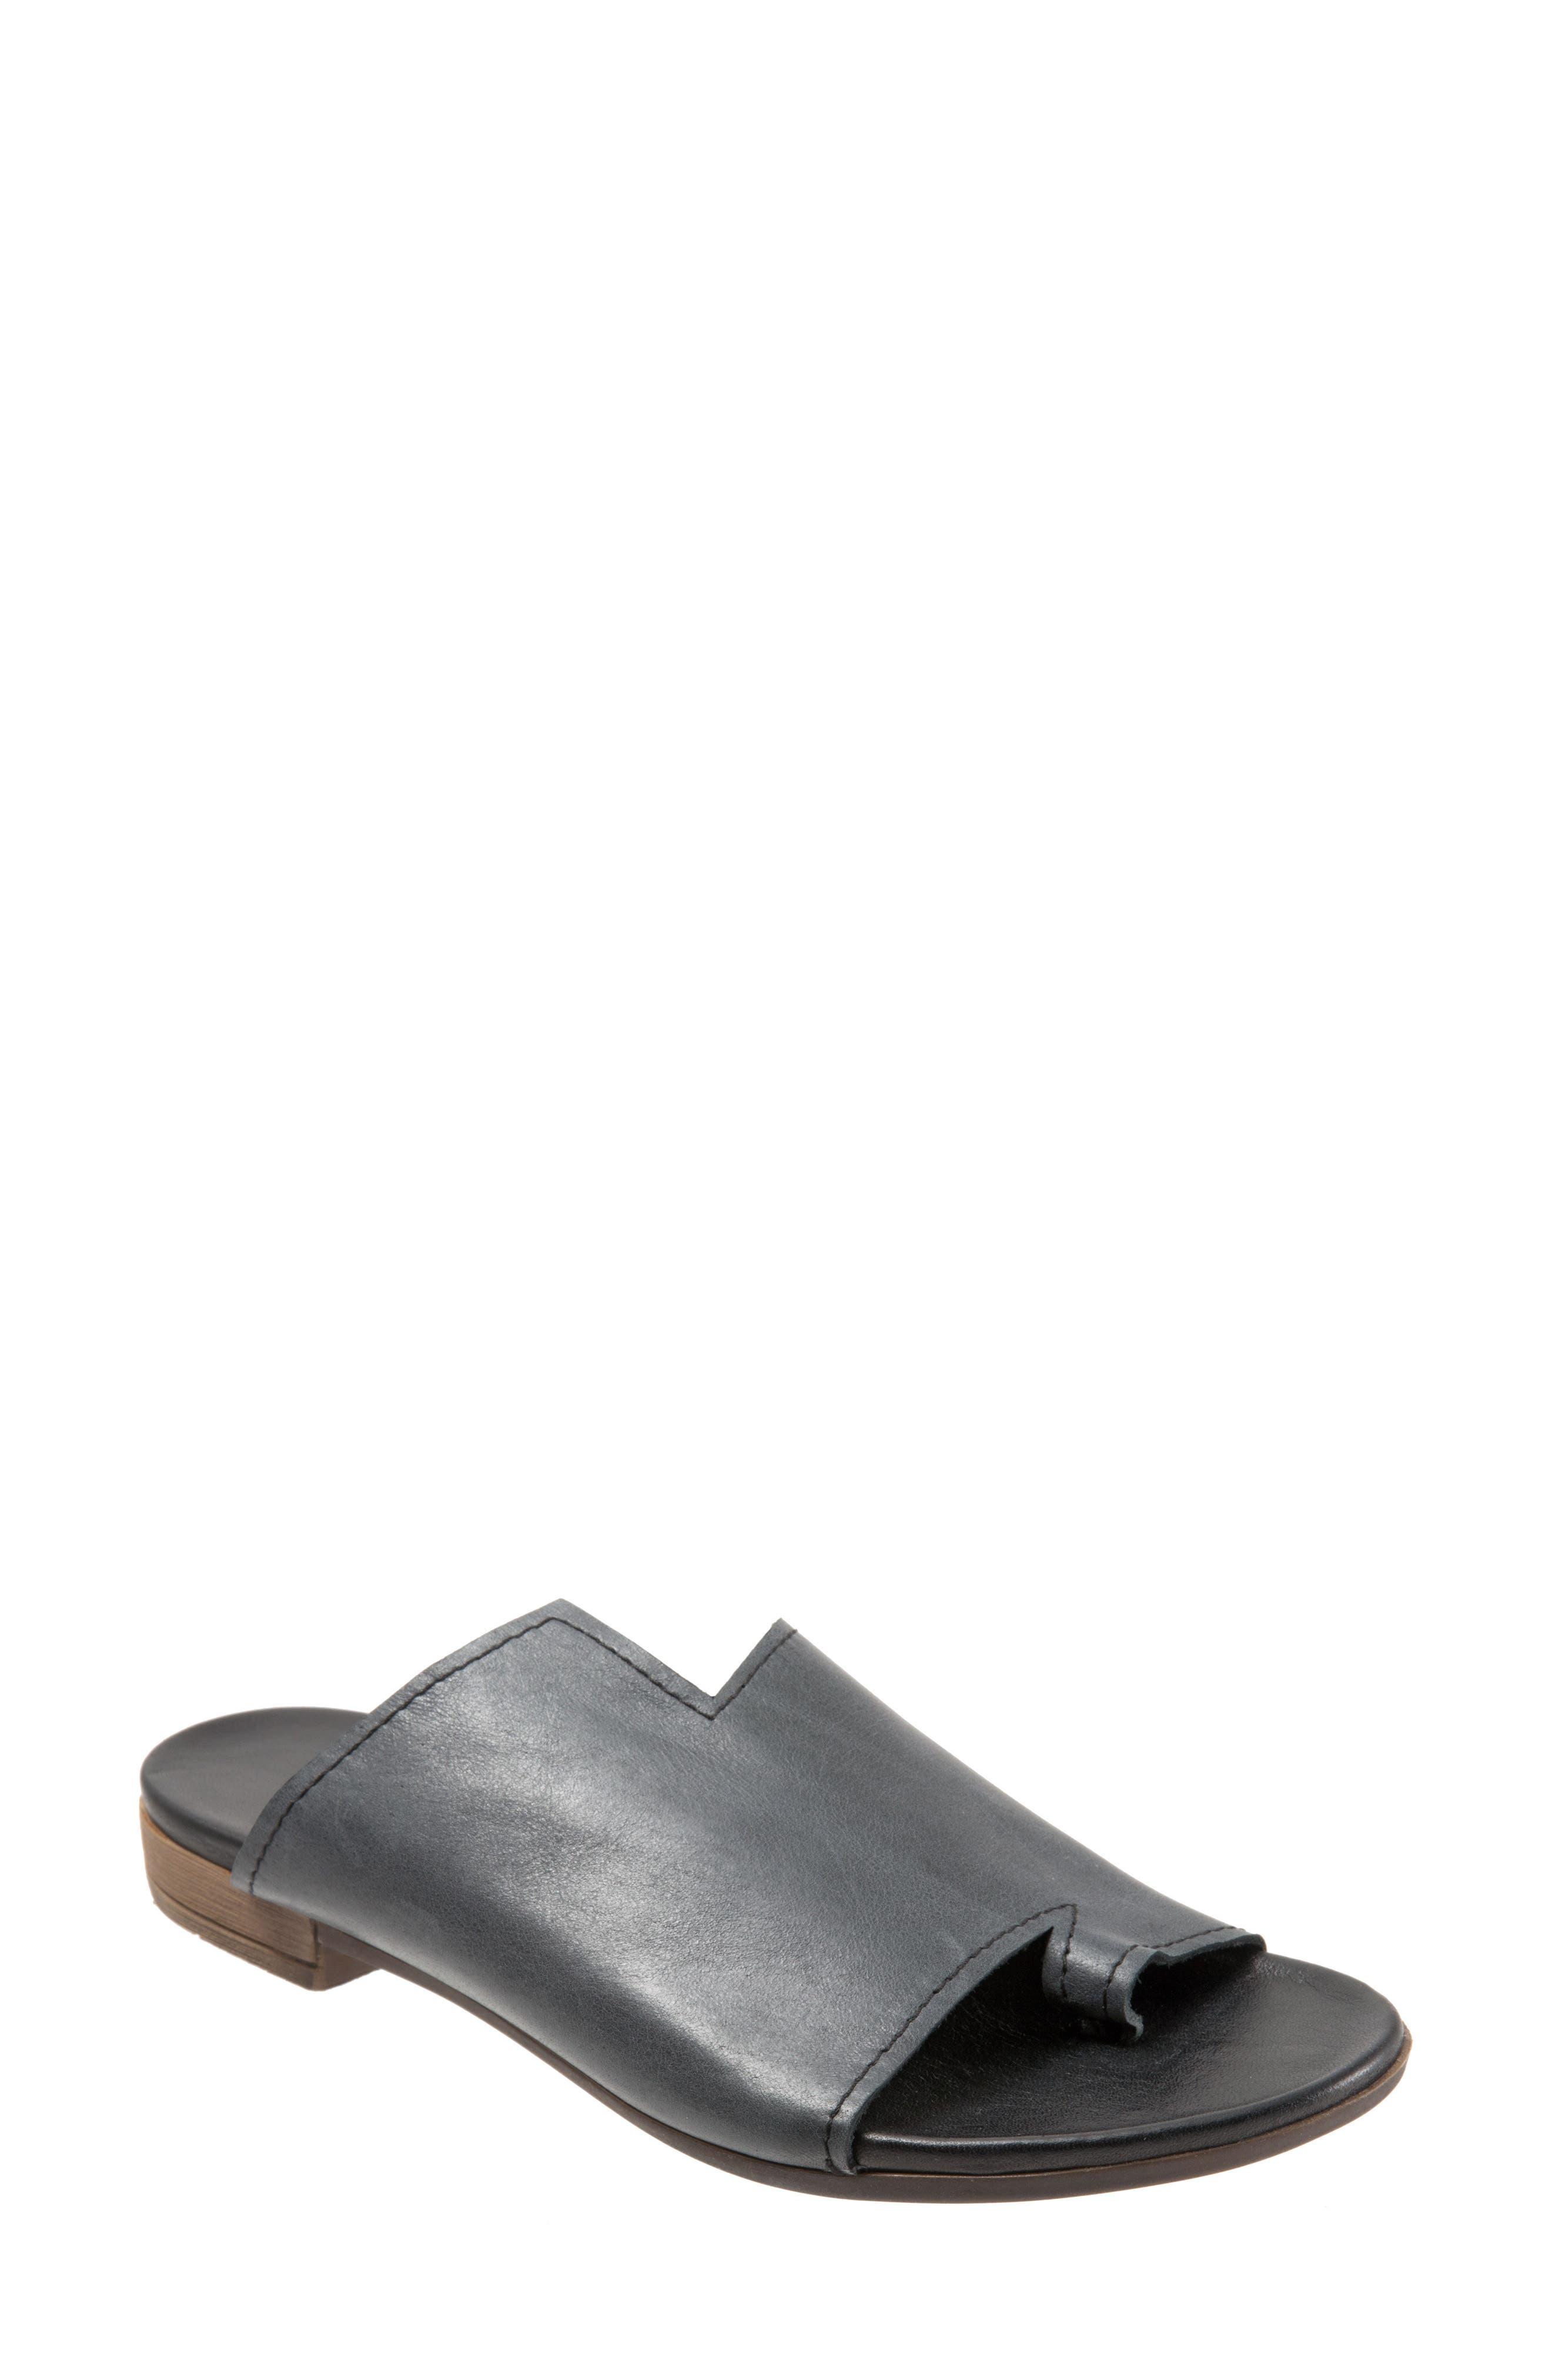 Tulla Sandal,                         Main,                         color, Black Leather